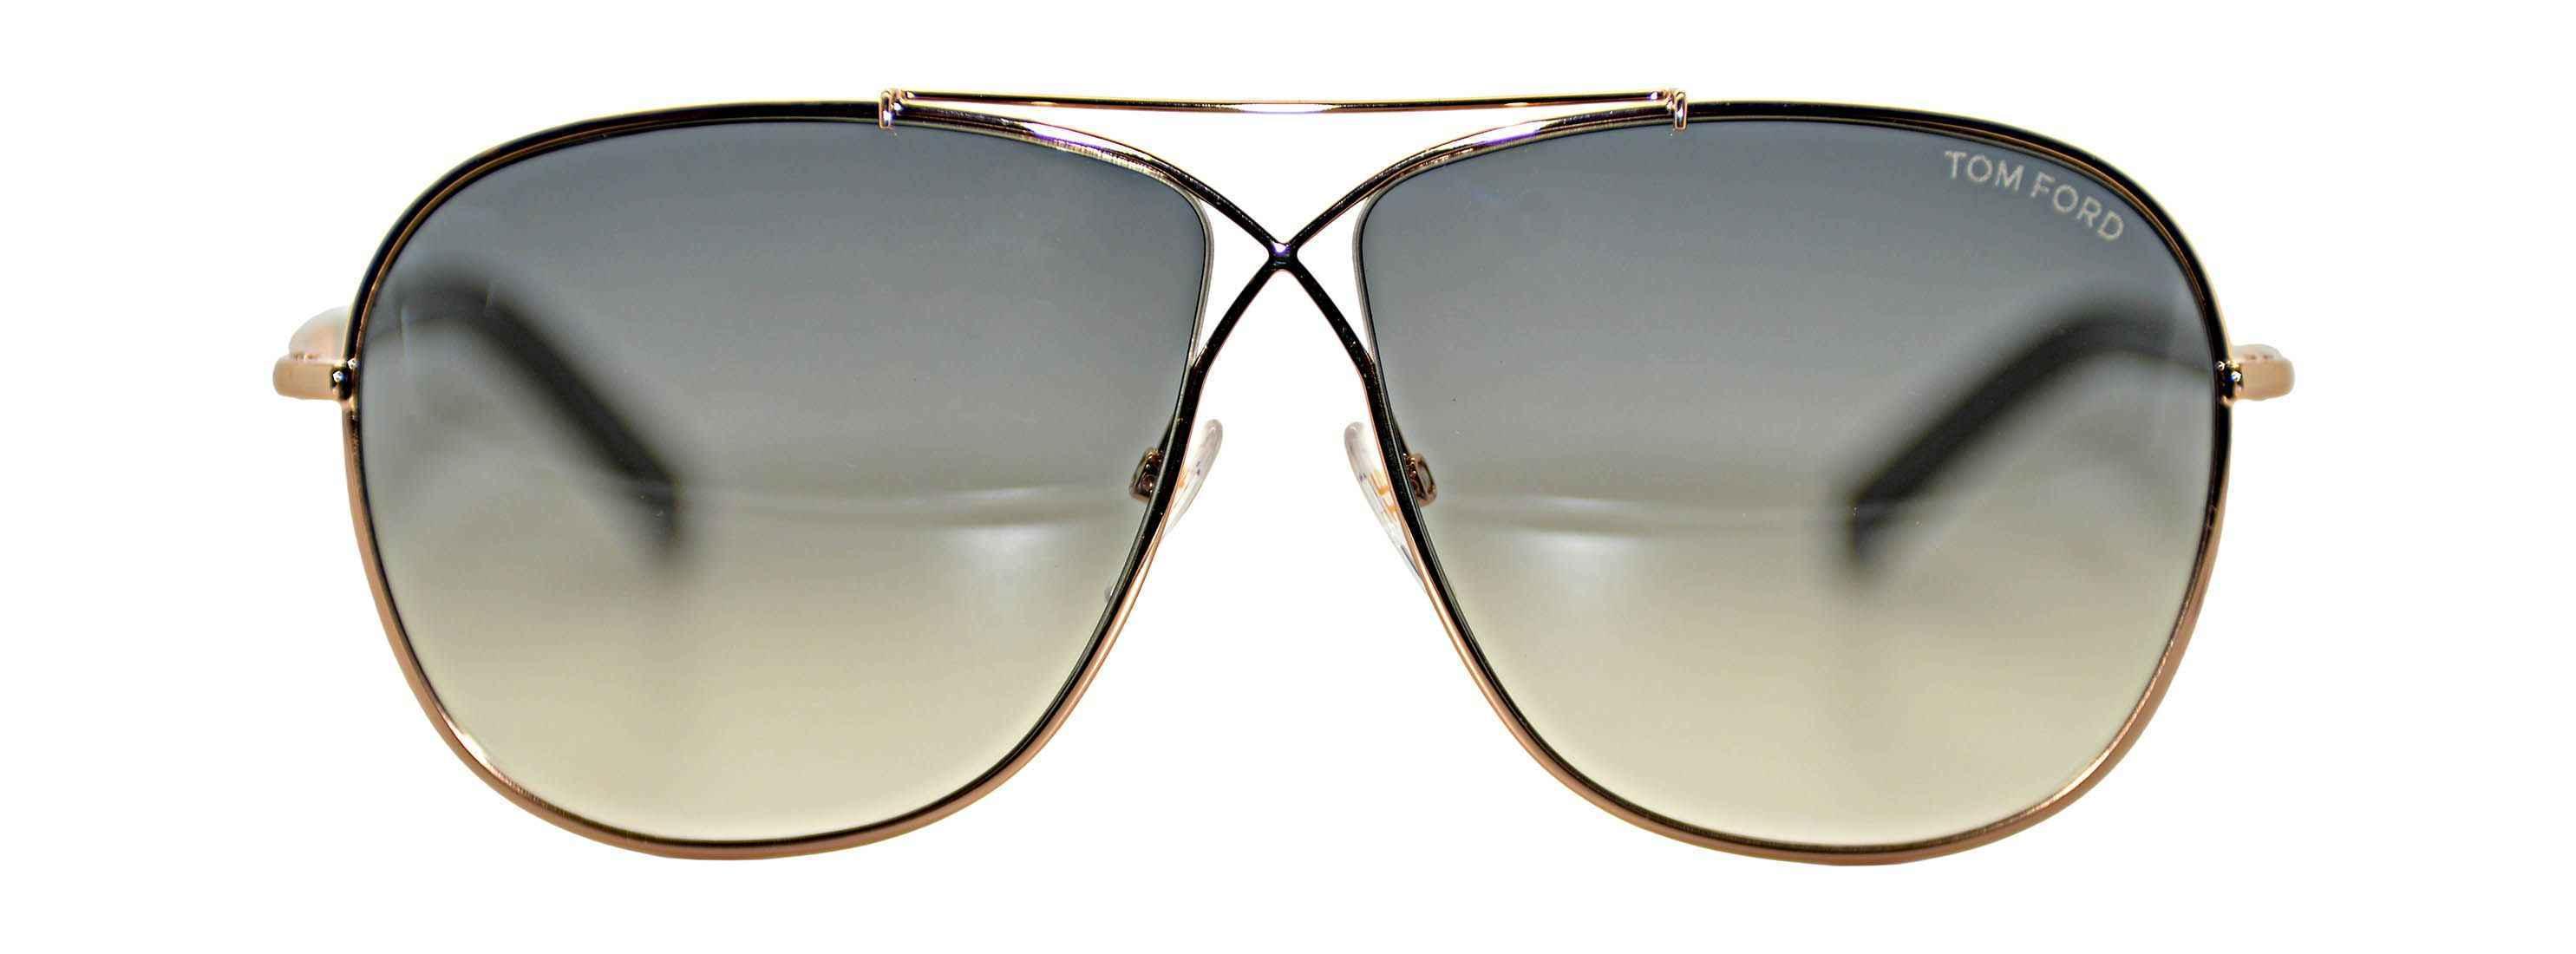 Tom Ford Sunglasses 393 28p 2 2970x1100